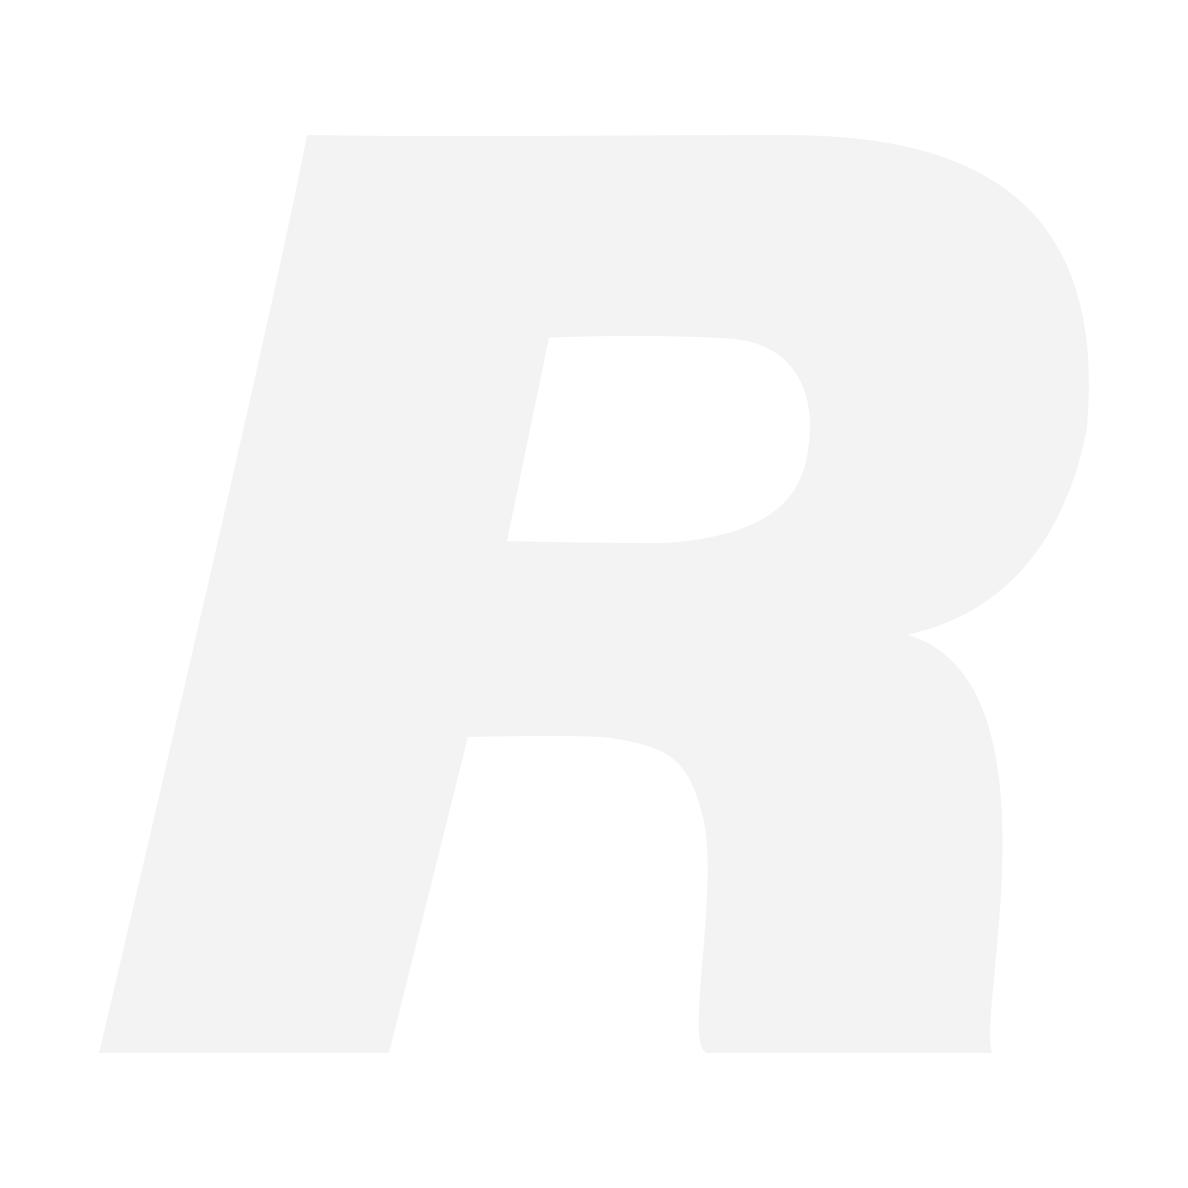 Fujifilm RDP Provia 100F 120-diafilm (5st rullar)